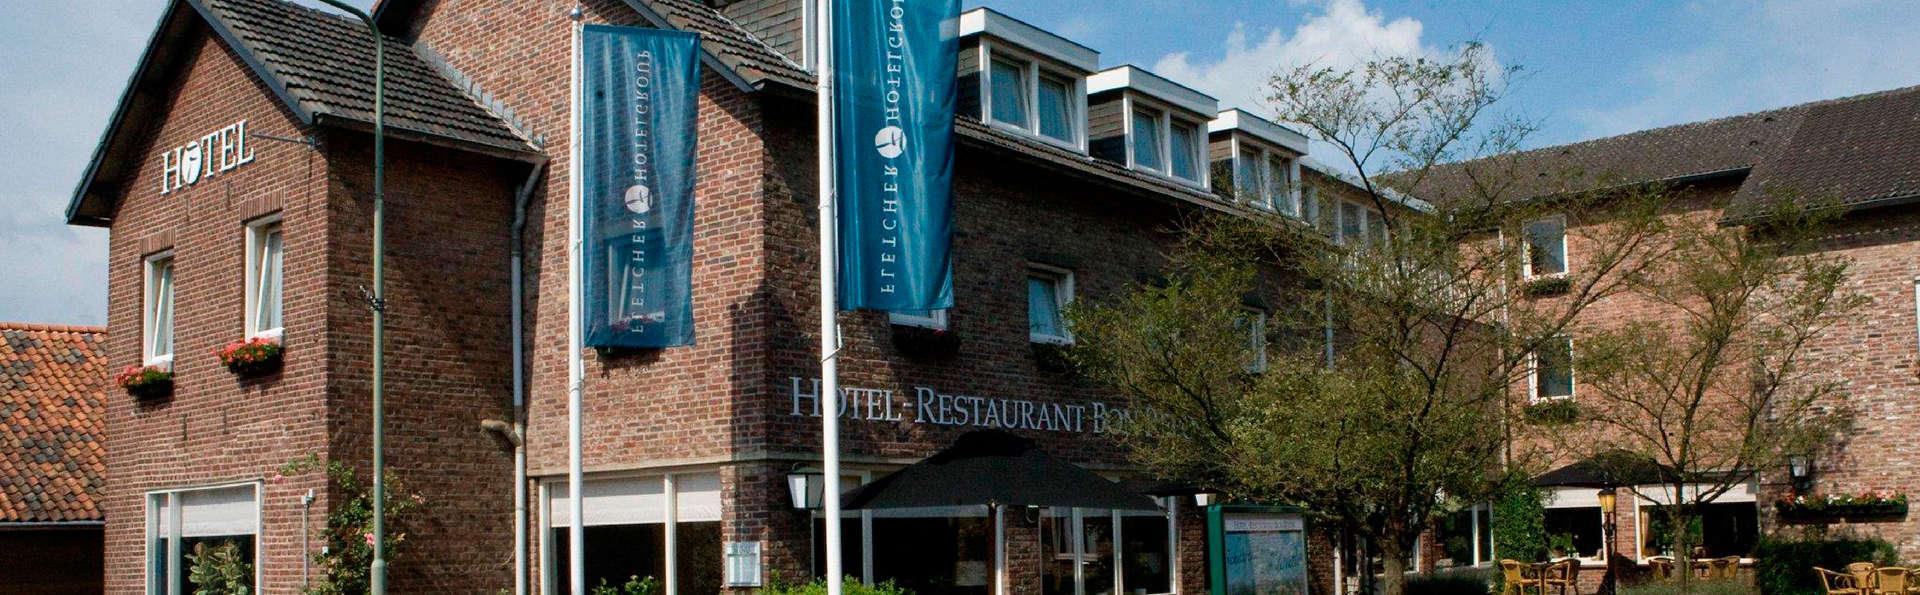 Fletcher Hotel-Restaurant Bon Repos - EDIT_front.jpg